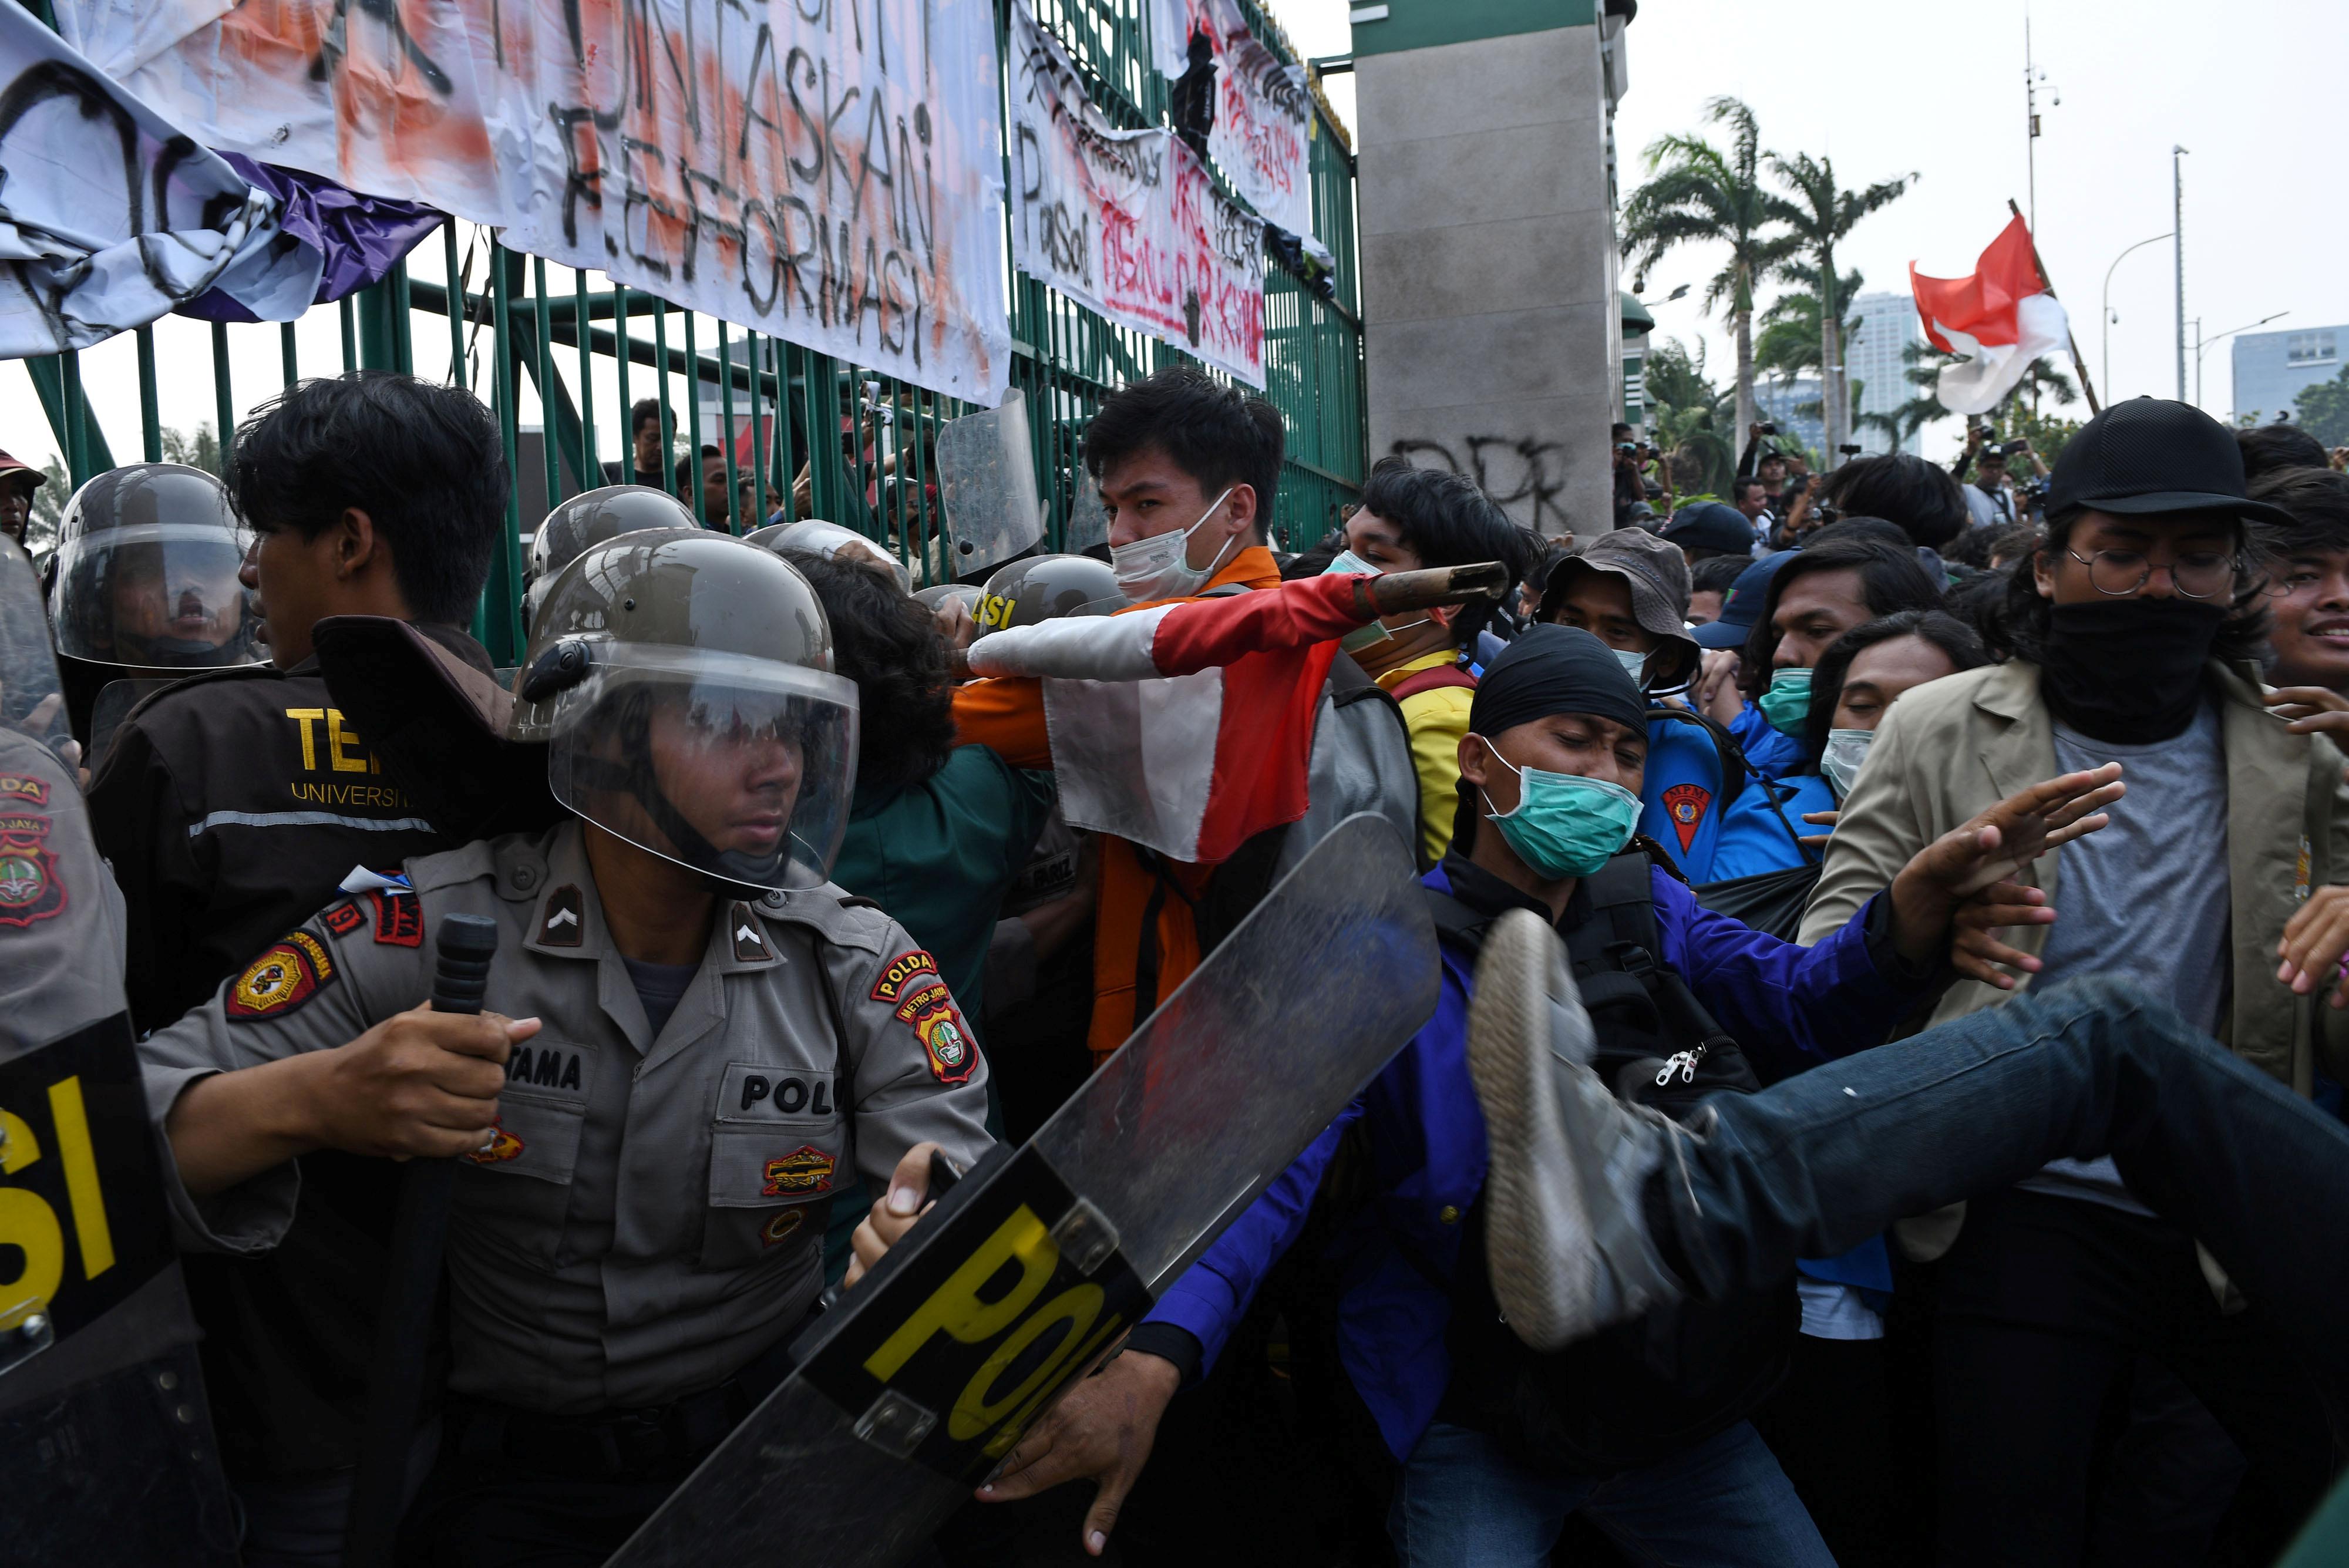 20190925 indo protest.JPG